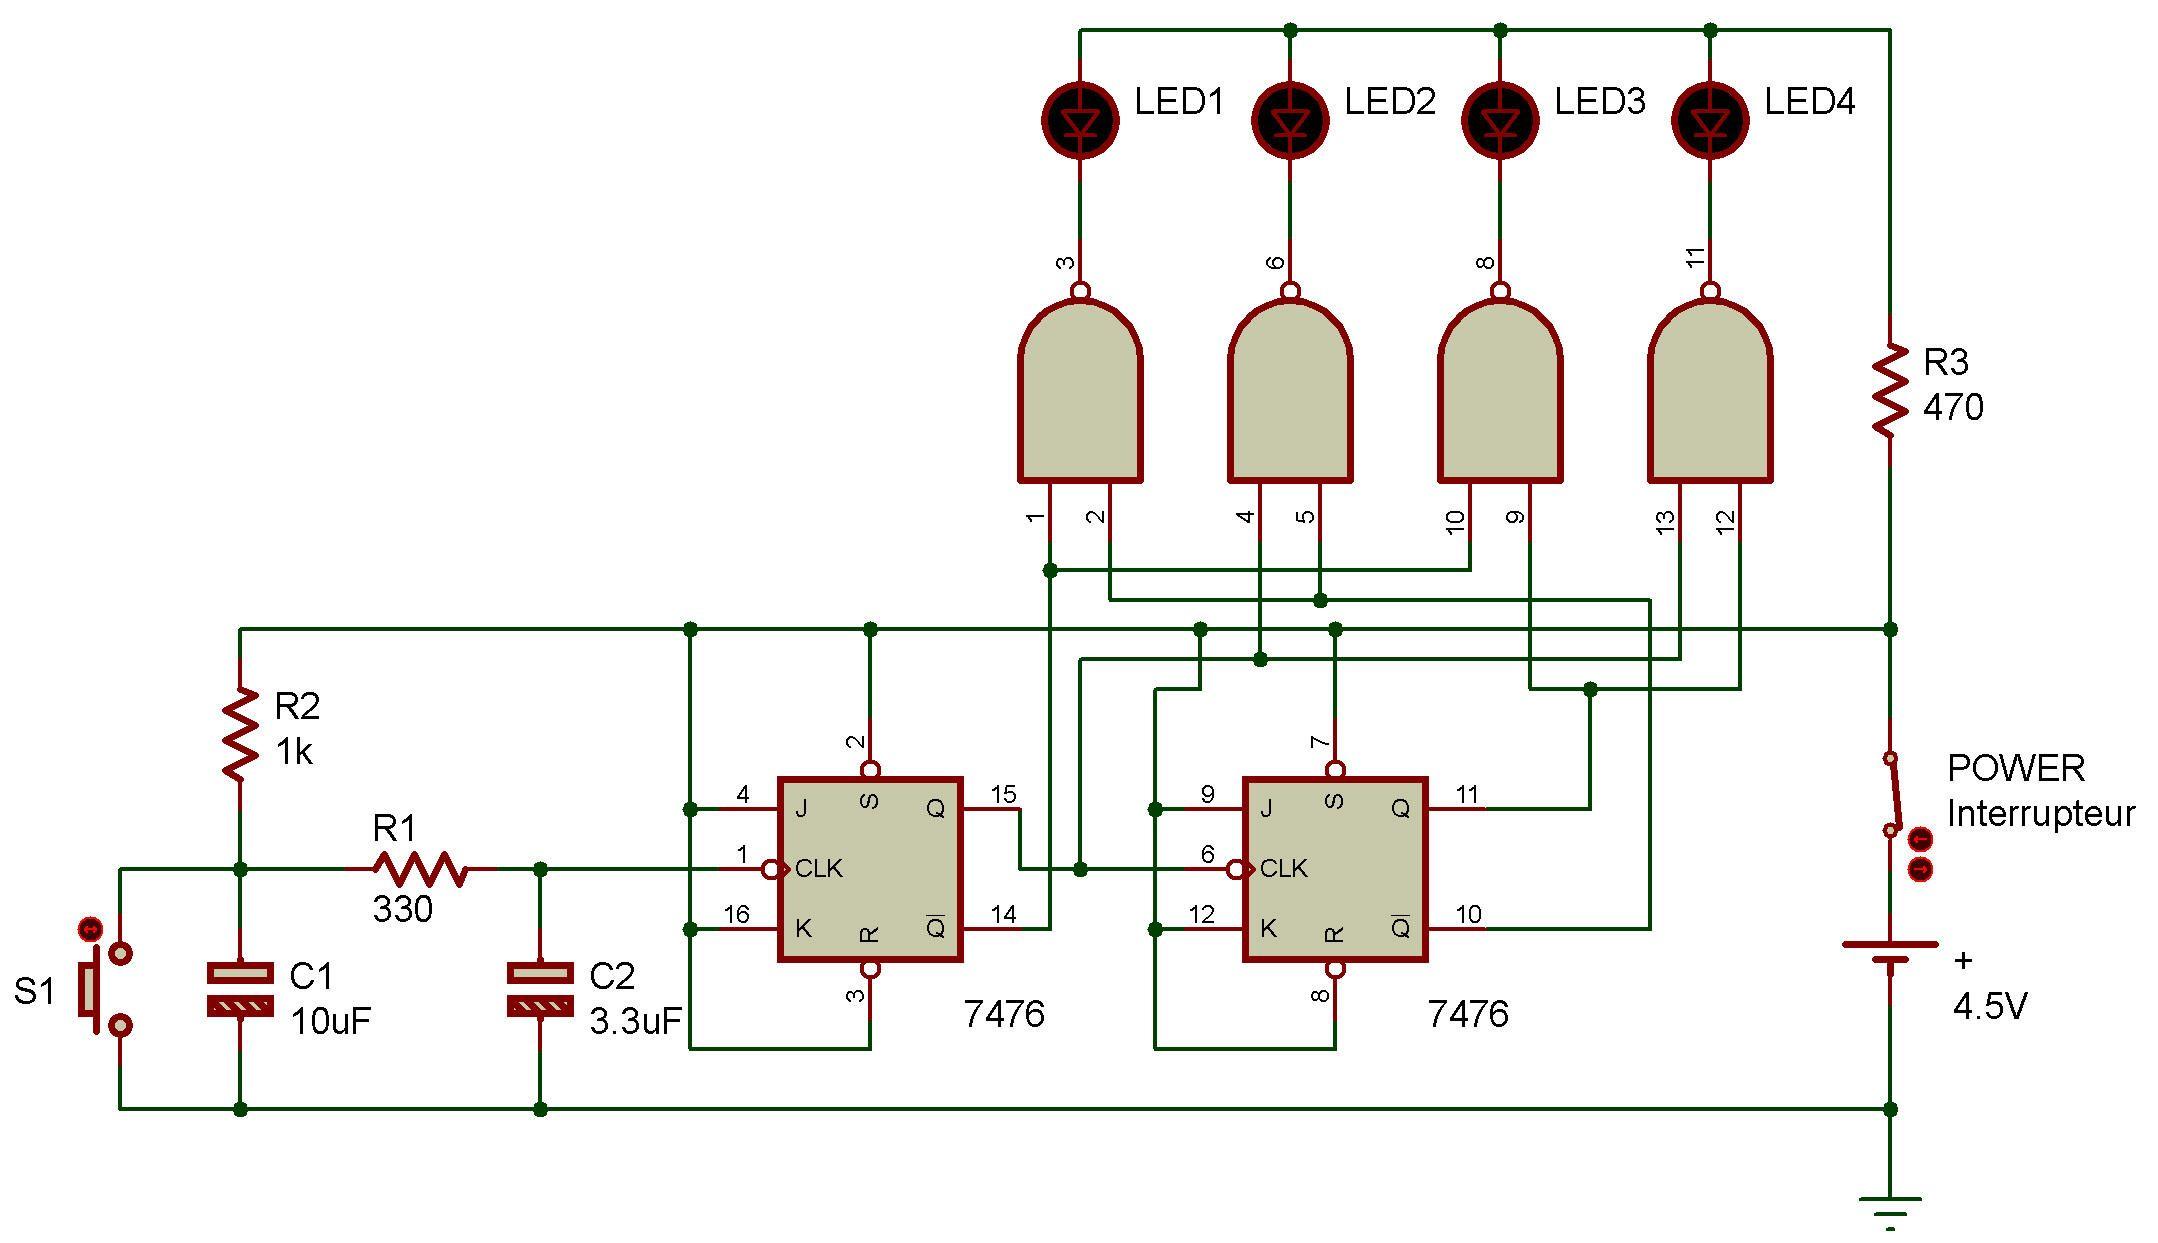 Wondrous Or Gate Circuit Diagram Tradeoficcom Diagram Data Schema Wiring Cloud Hisonuggs Outletorg